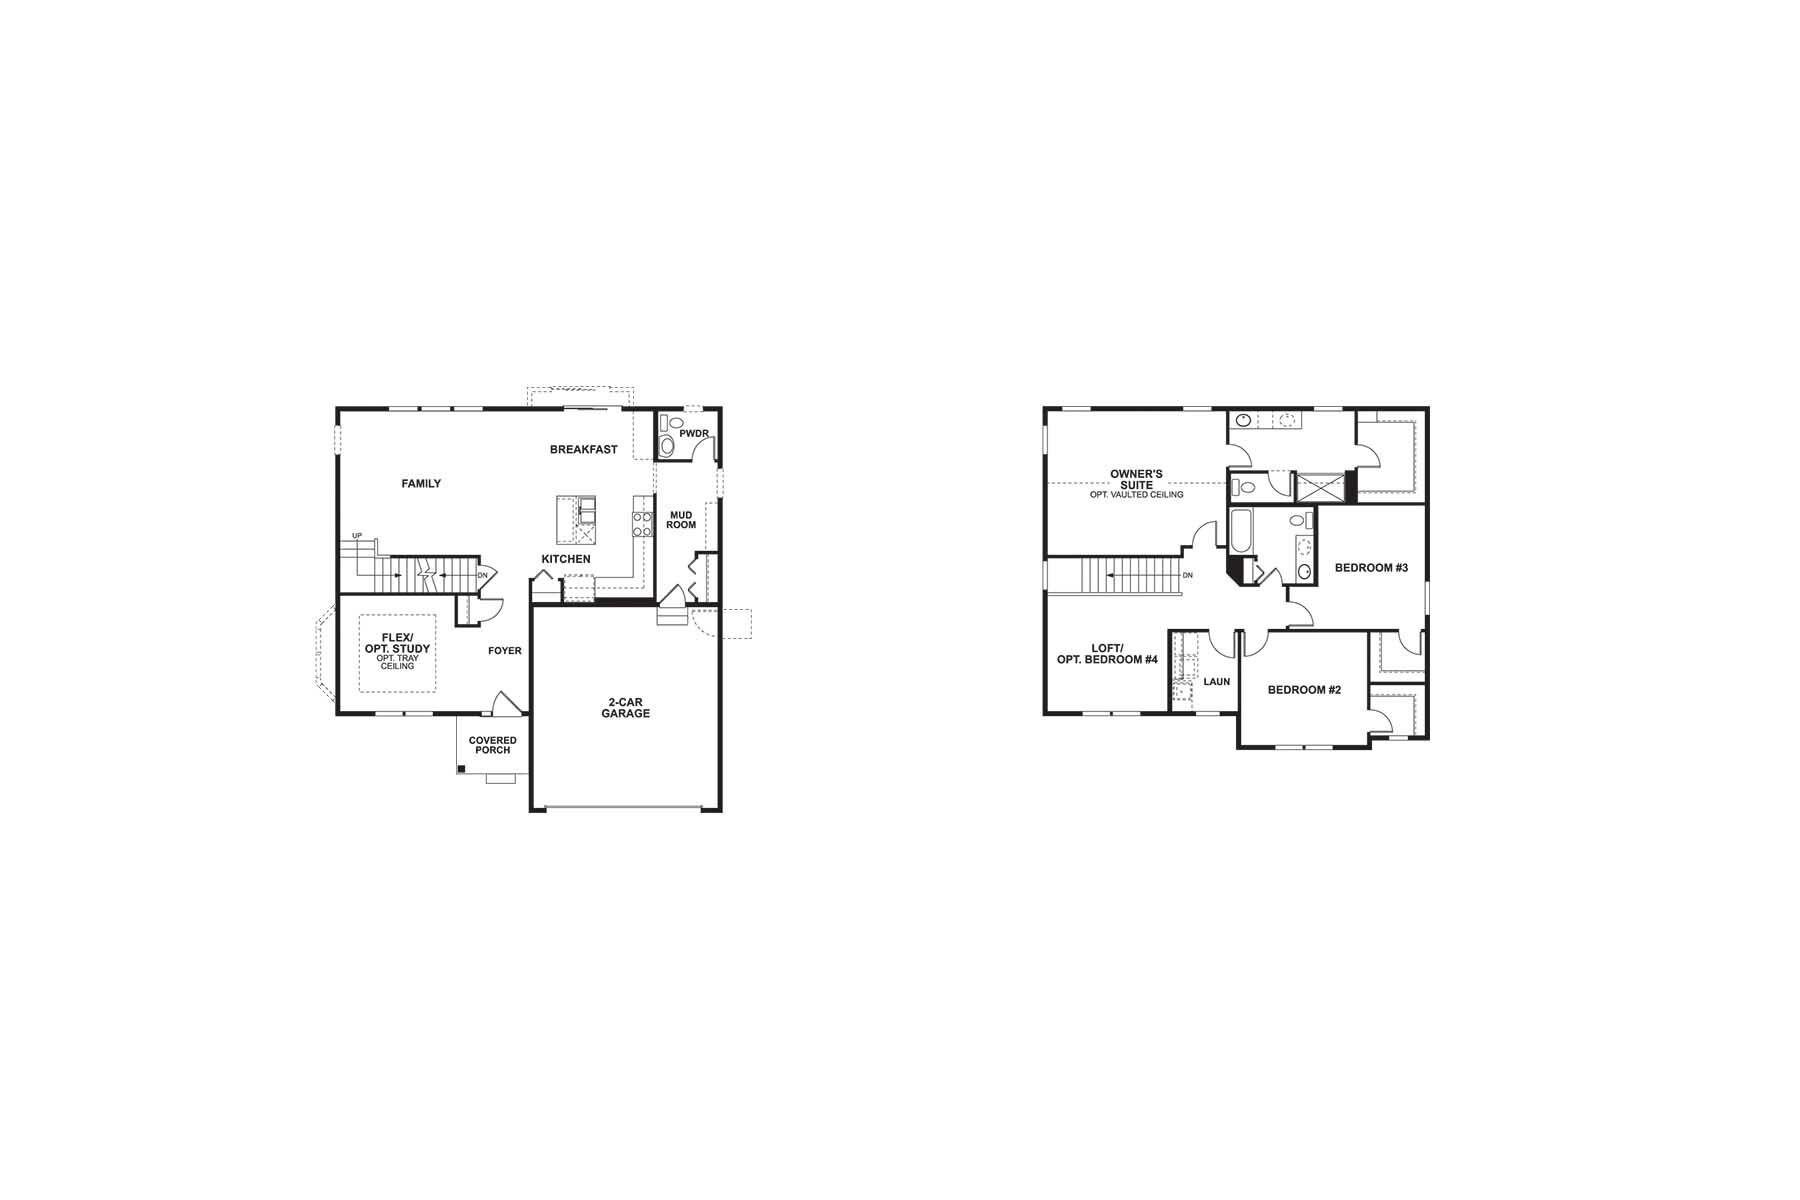 Cahill Floorplan